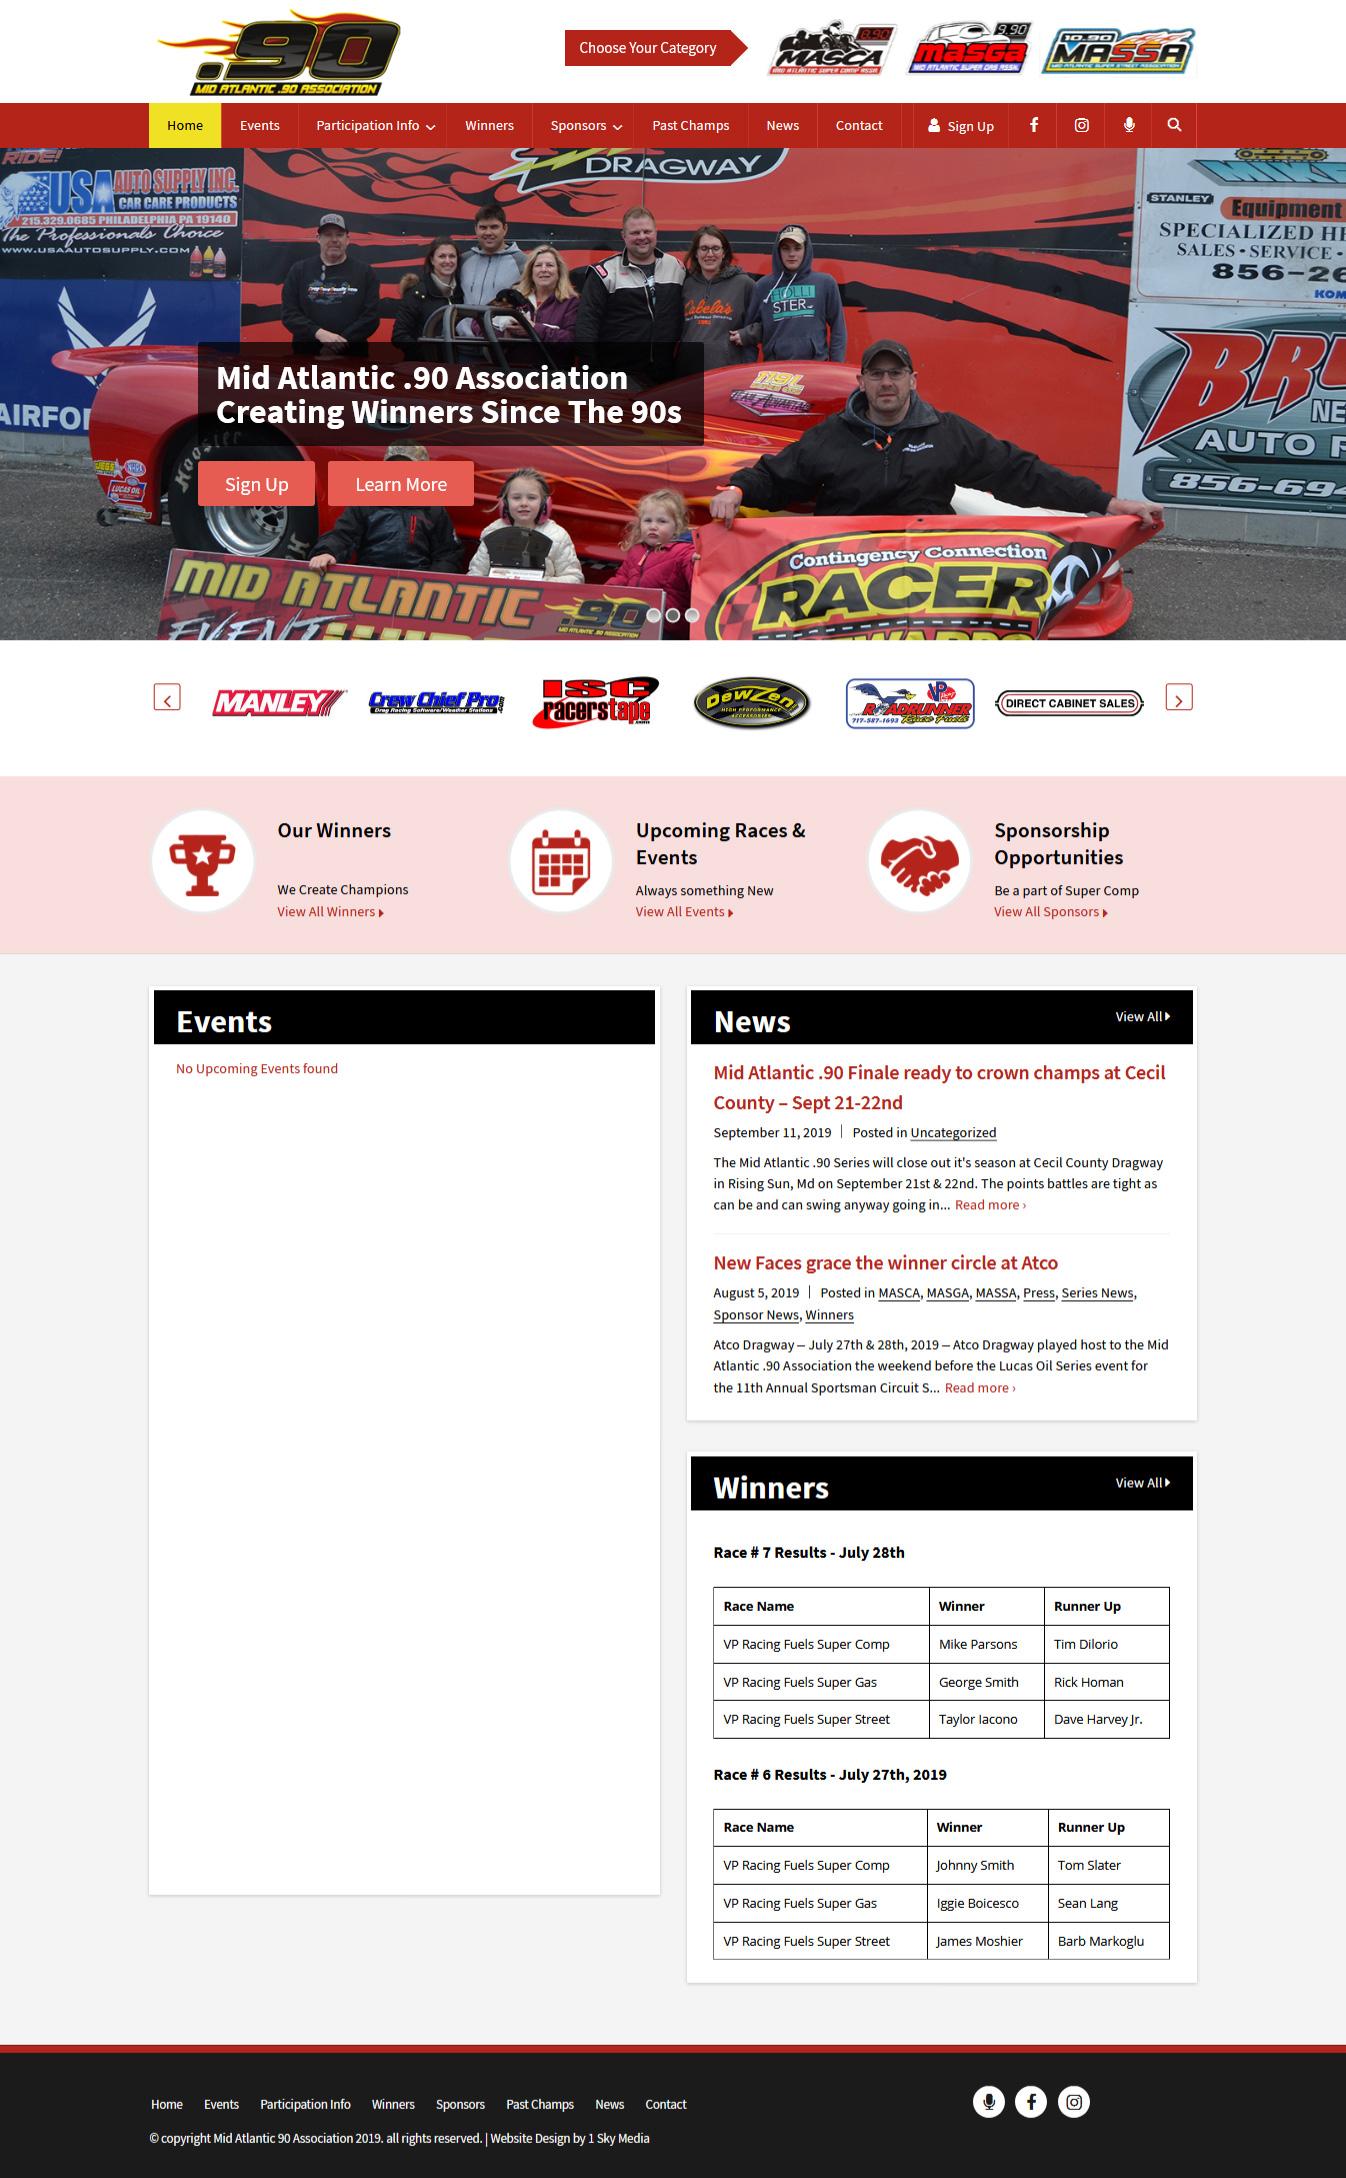 Mid Atlantic .90 drag racing association website design